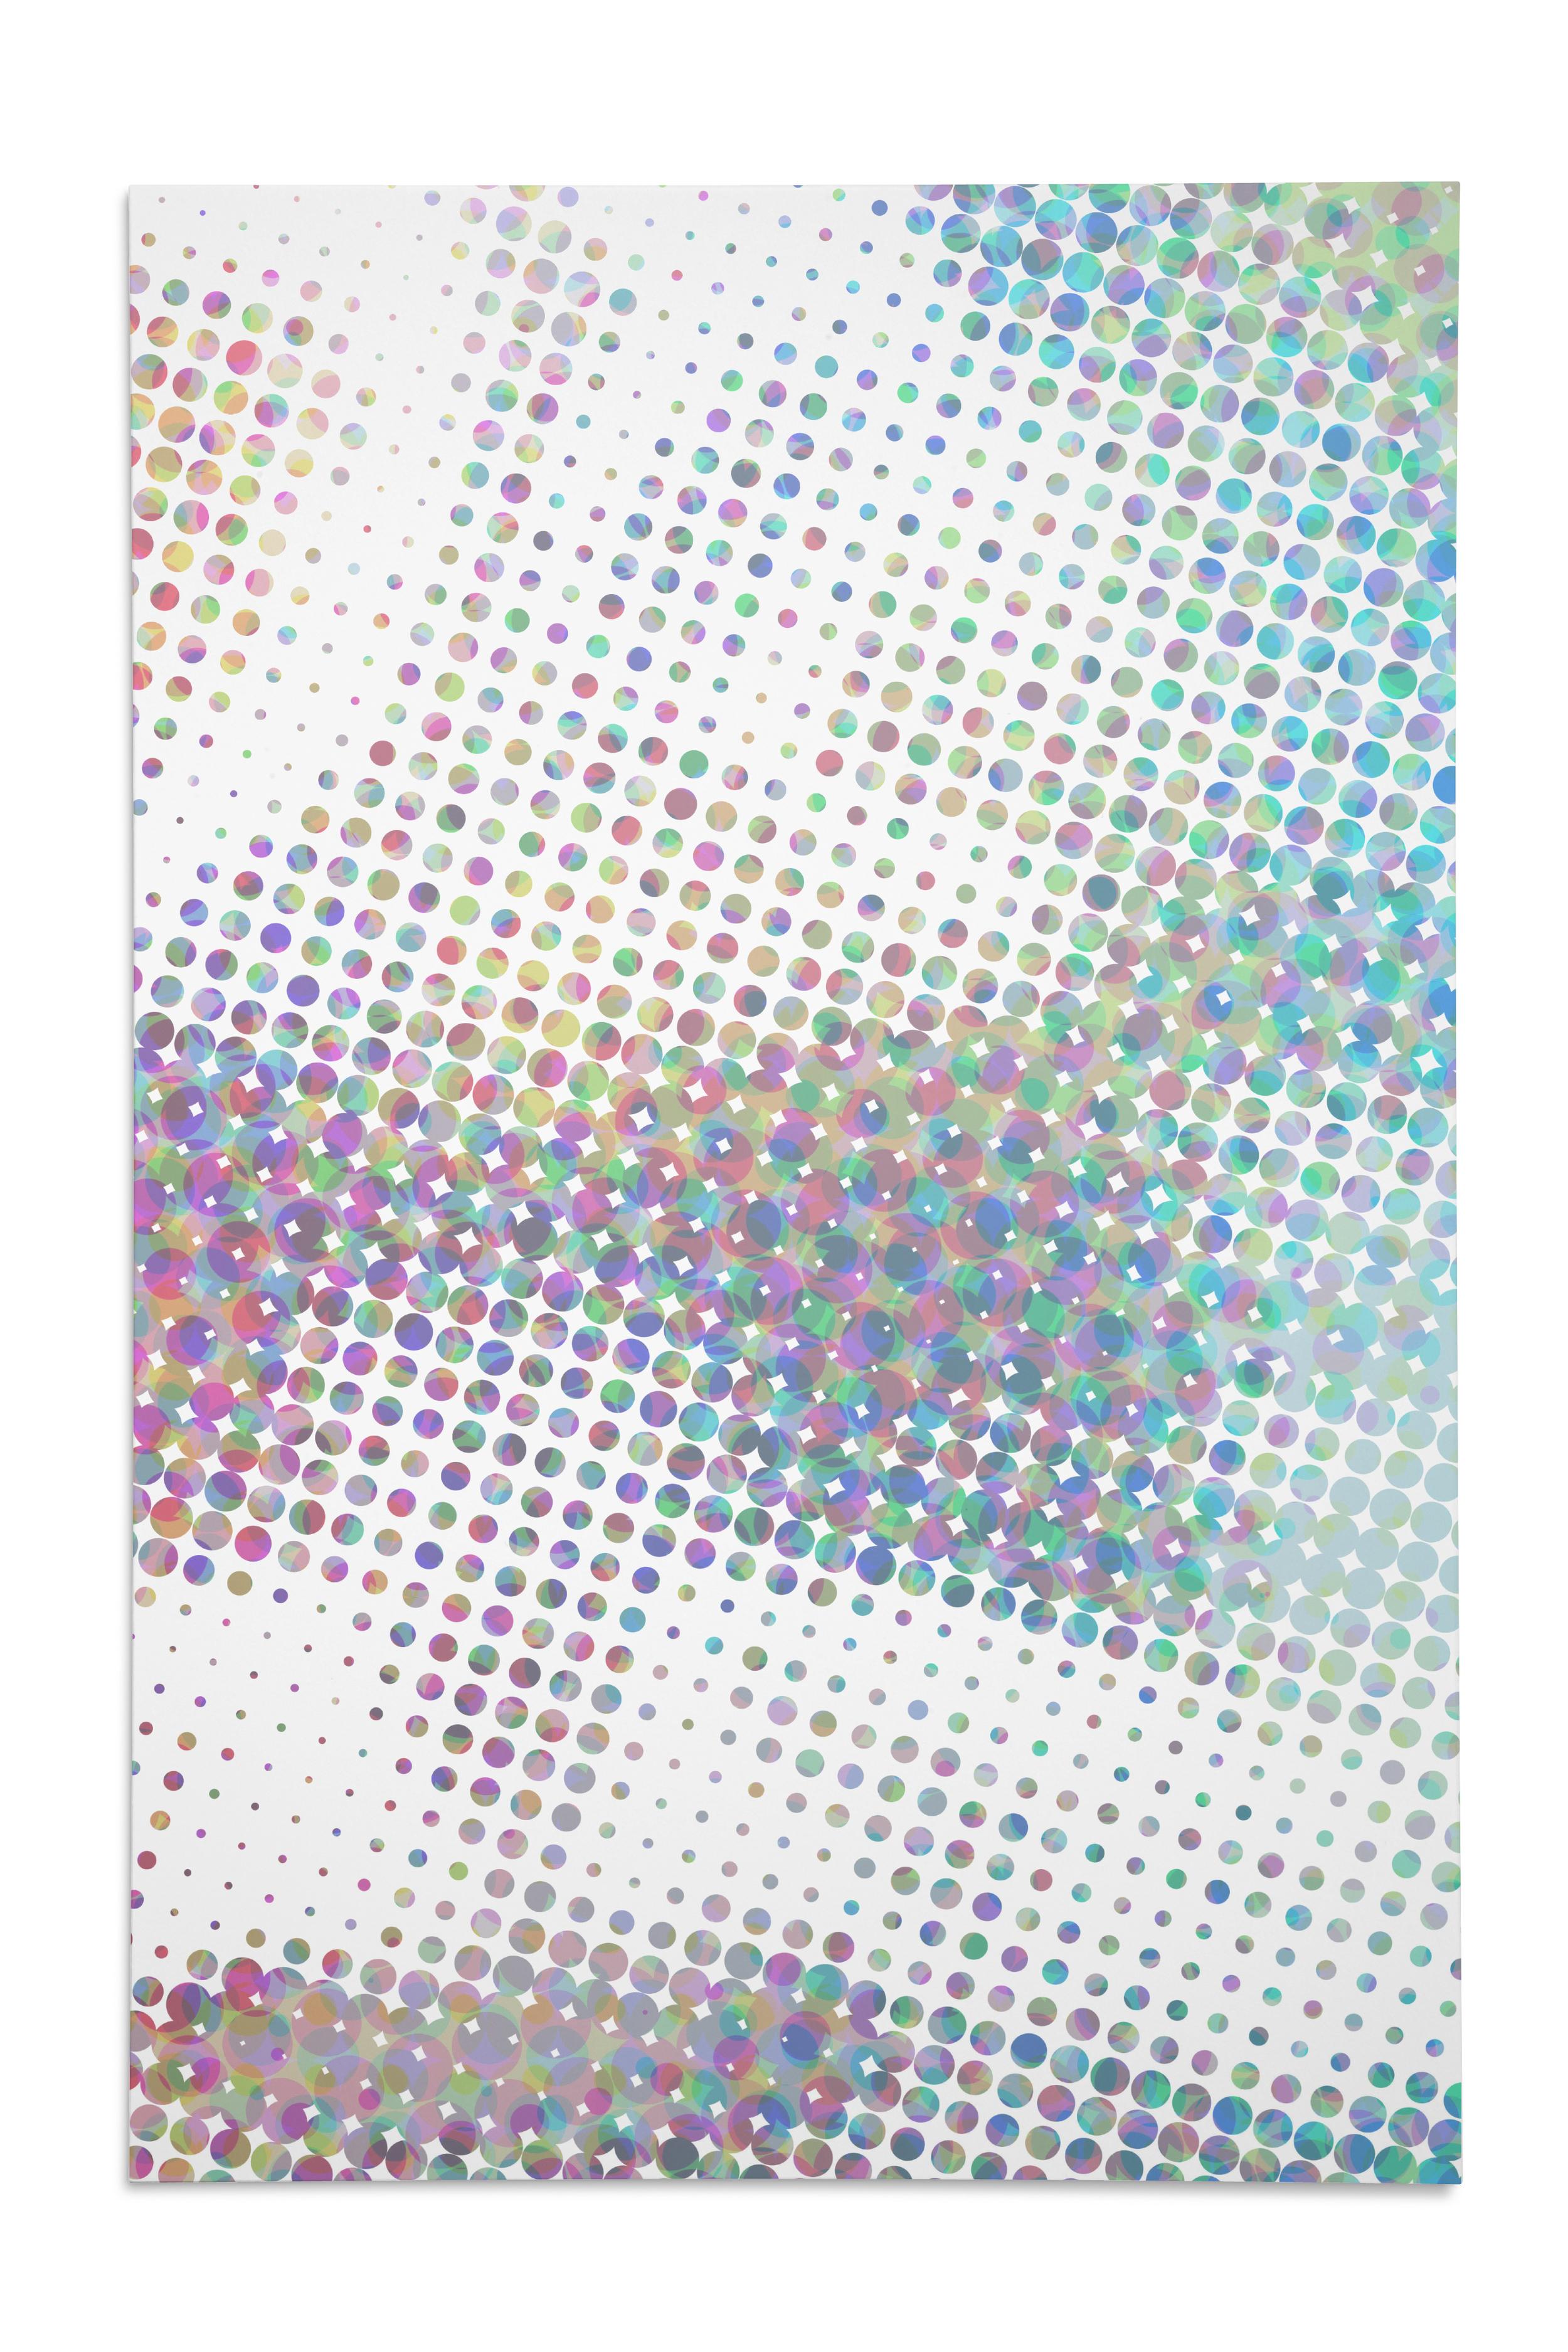 juicebox pattern 02 a